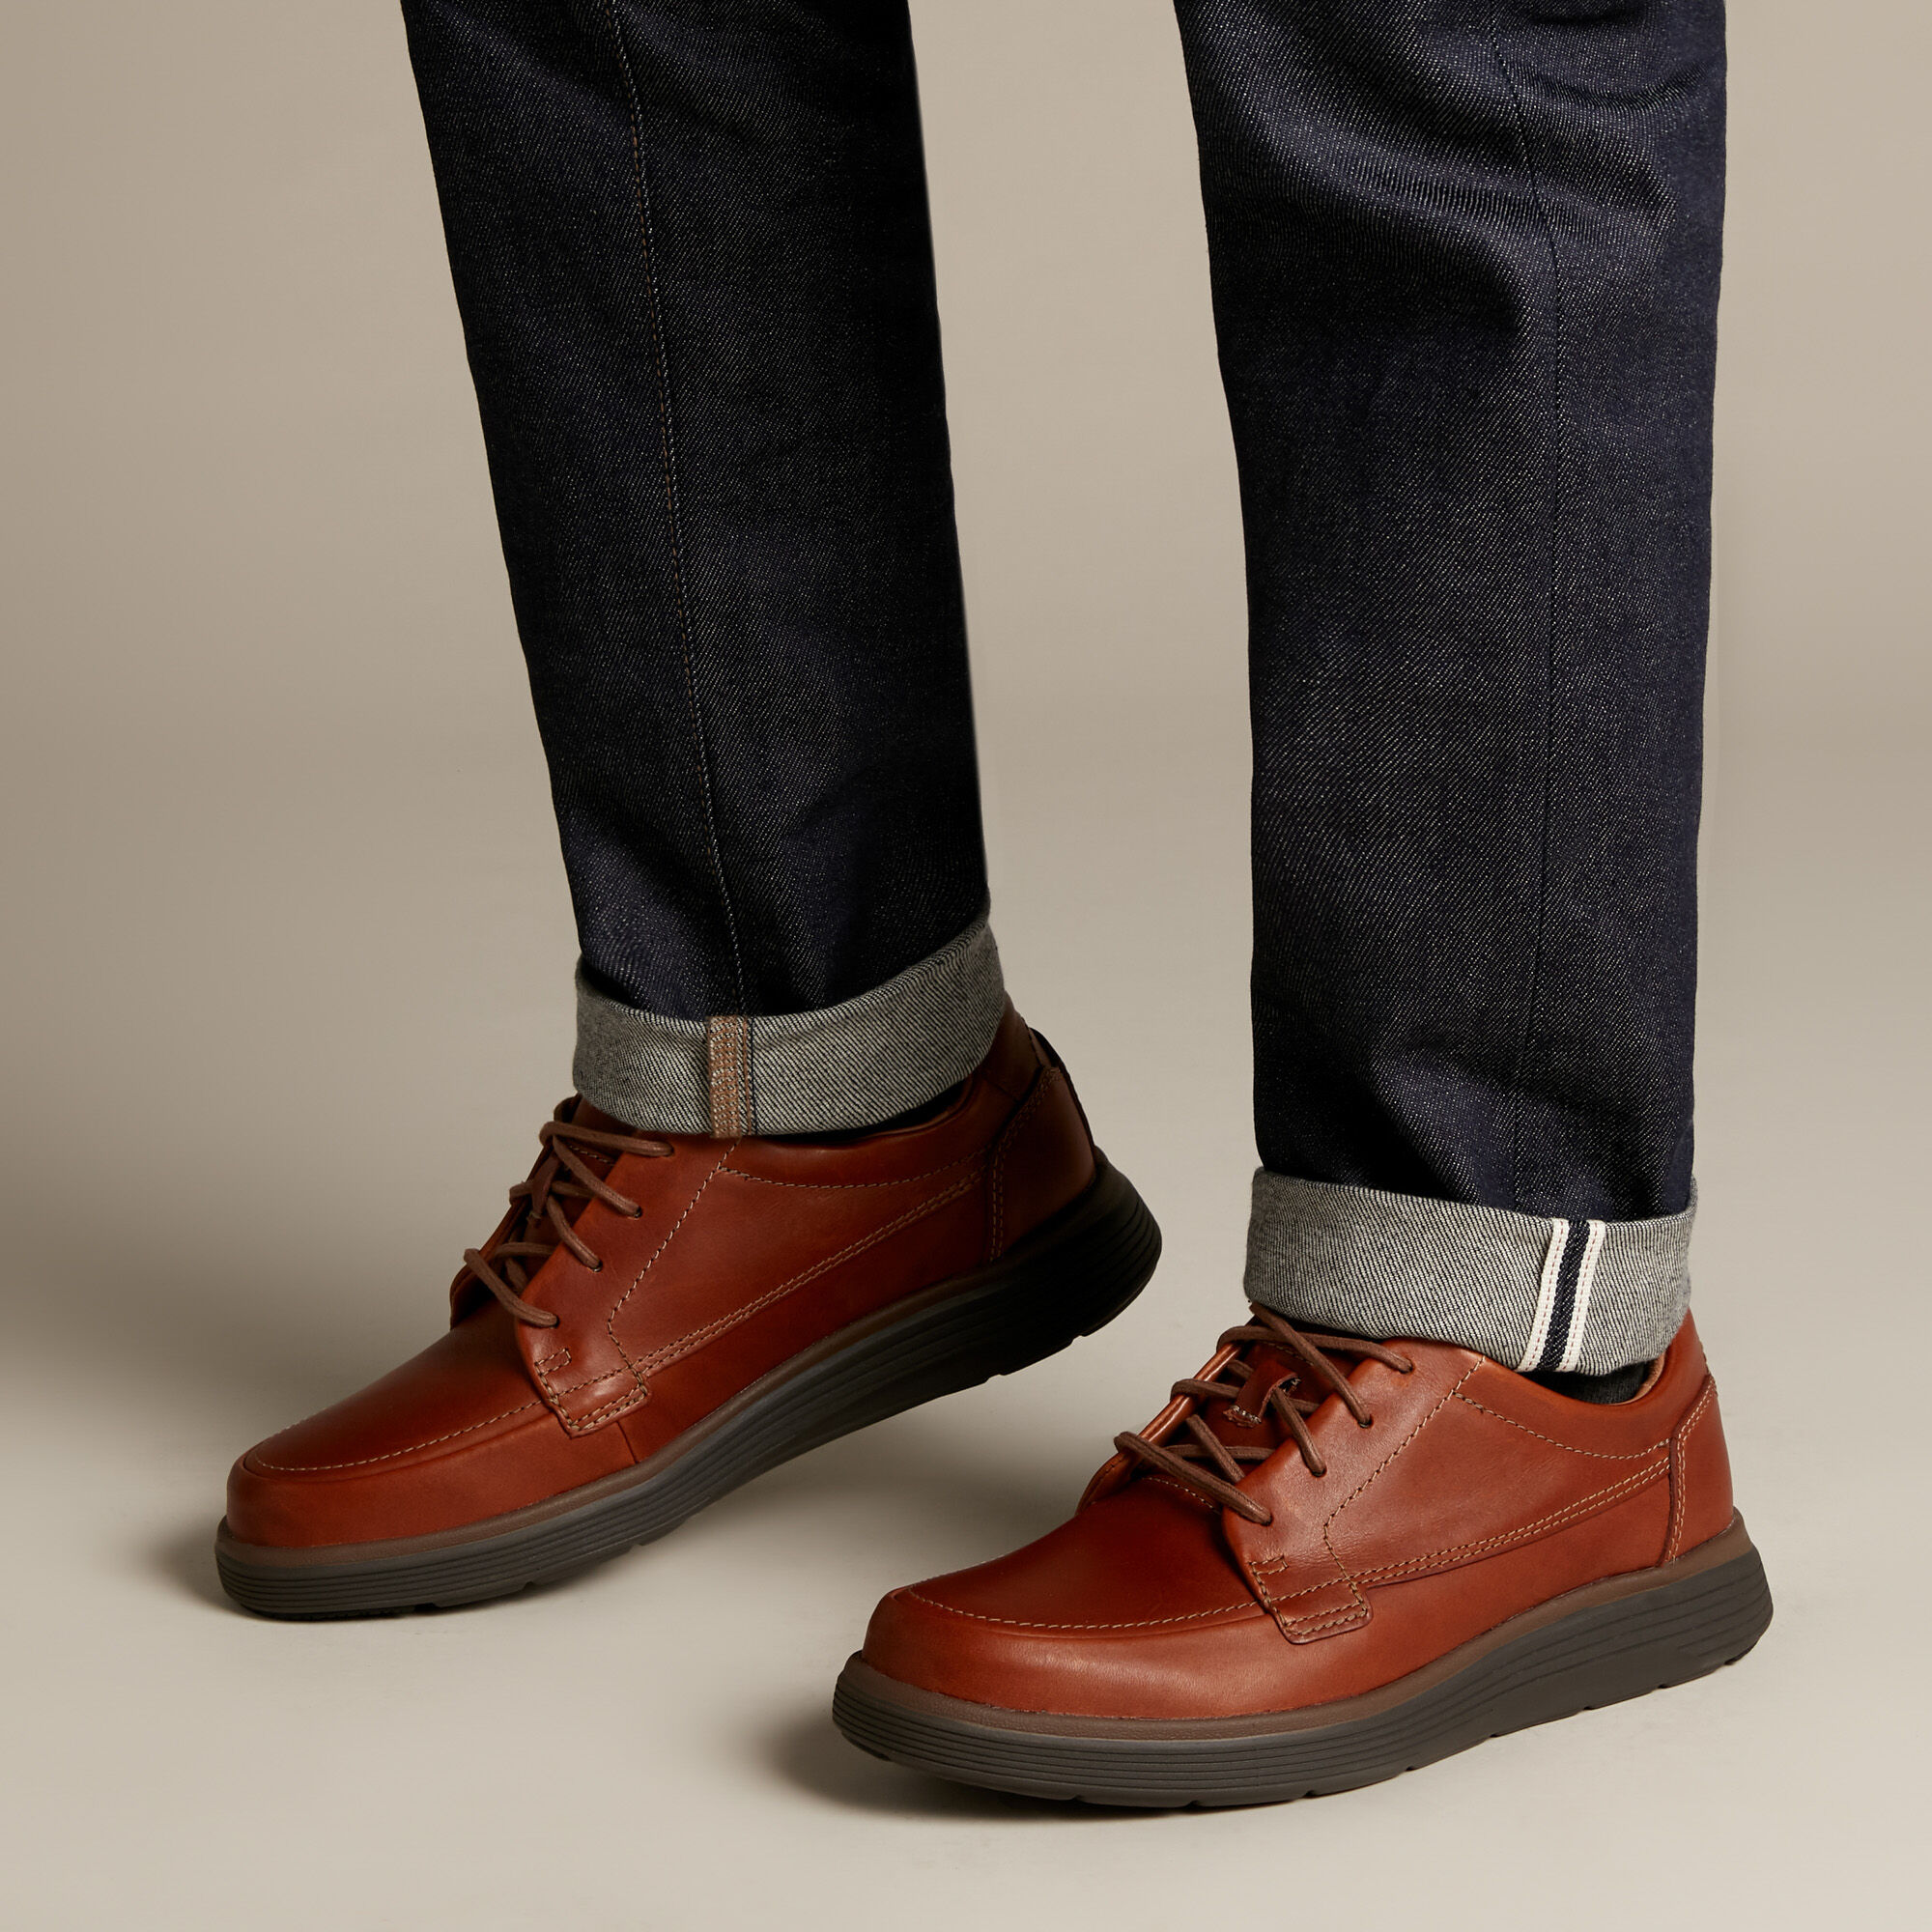 Dark Tan Leather Shoes - Un Abode Ease